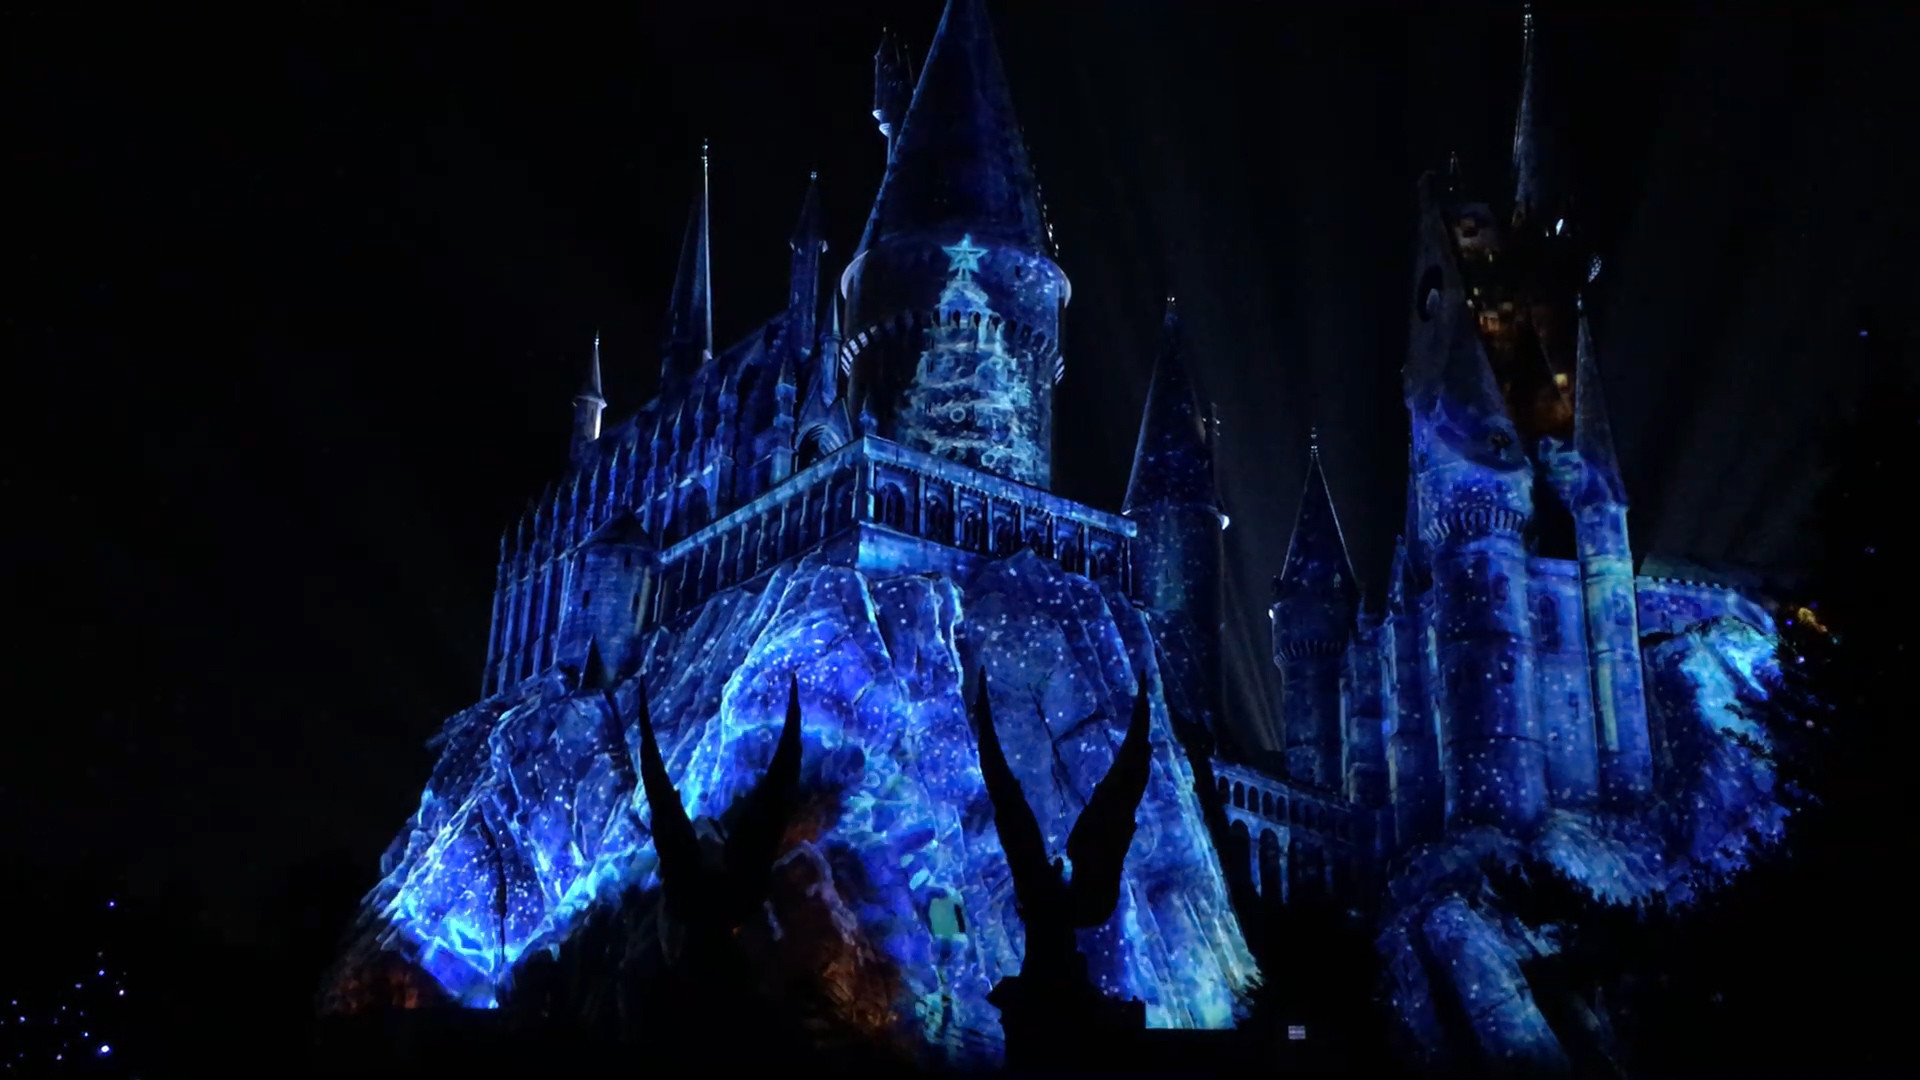 Amazing Wallpaper Harry Potter Christmas - os-christmas-at-harry-potter-wizarding-world-20171117  Photograph_626850.com/img-5a0eeefb/turbine/os-christmas-at-harry-potter-wizarding-world-20171117